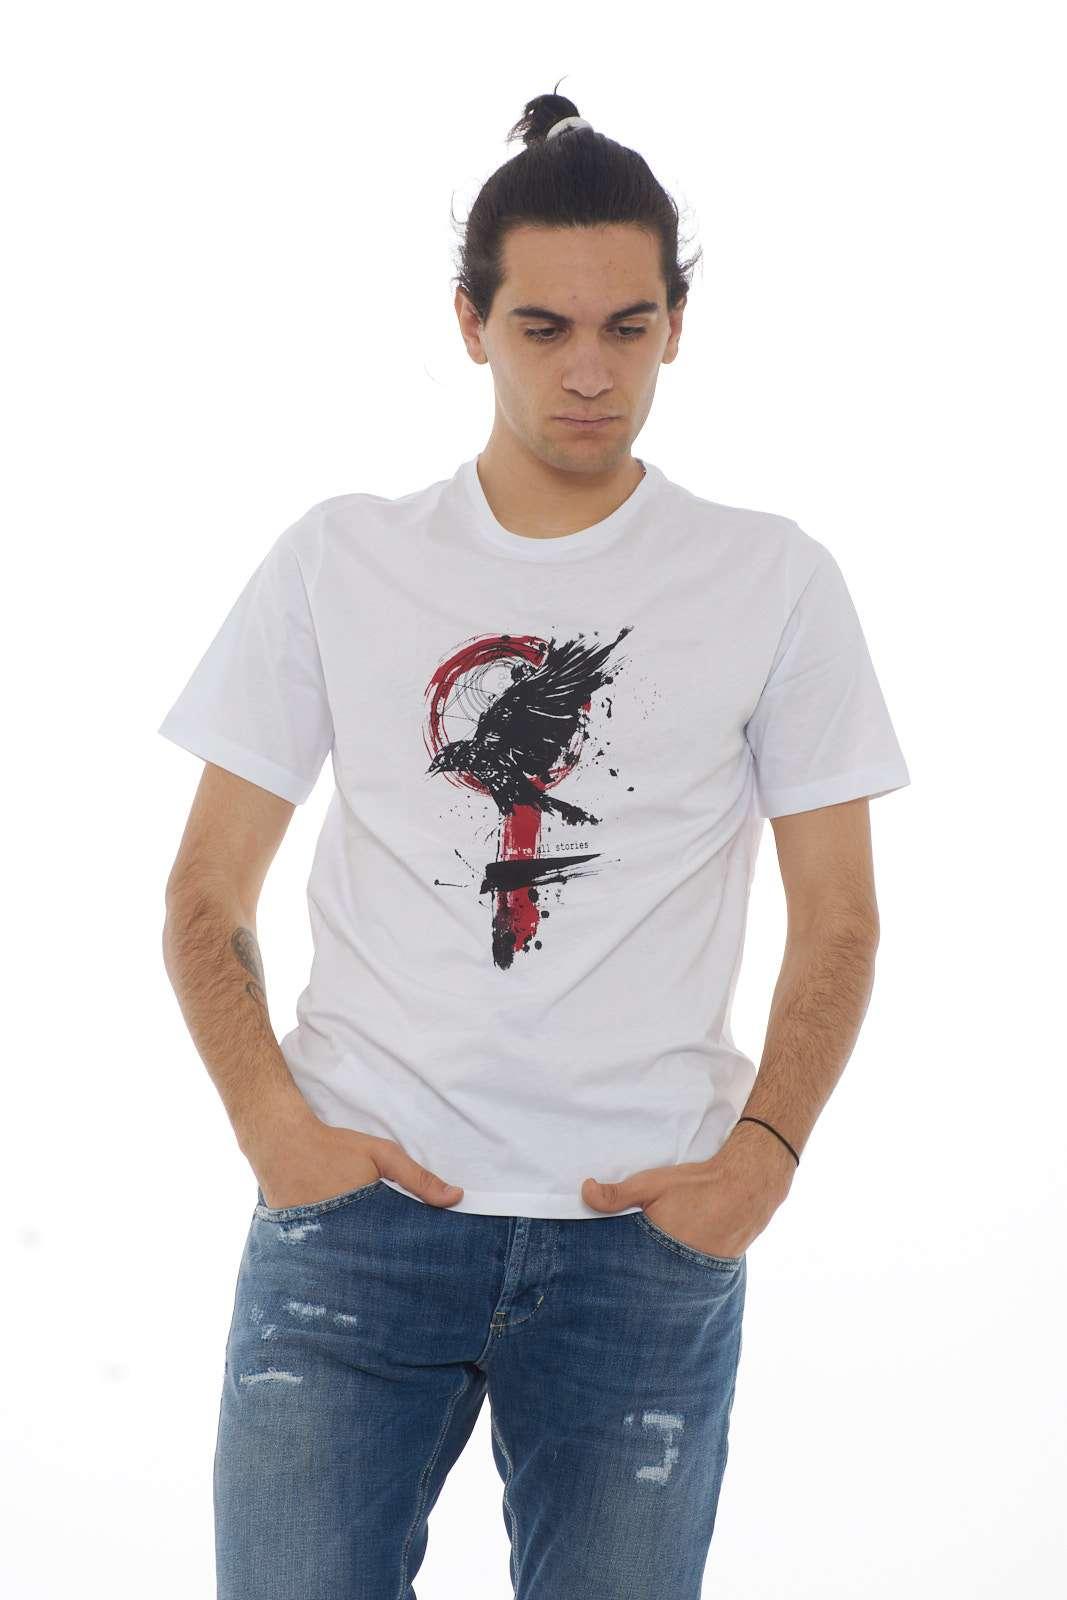 https://www.parmax.com/media/catalog/product/a/i/PE-outlet_parmax-t-shirt-uomo-Kaos-LP2CE024-A.jpg